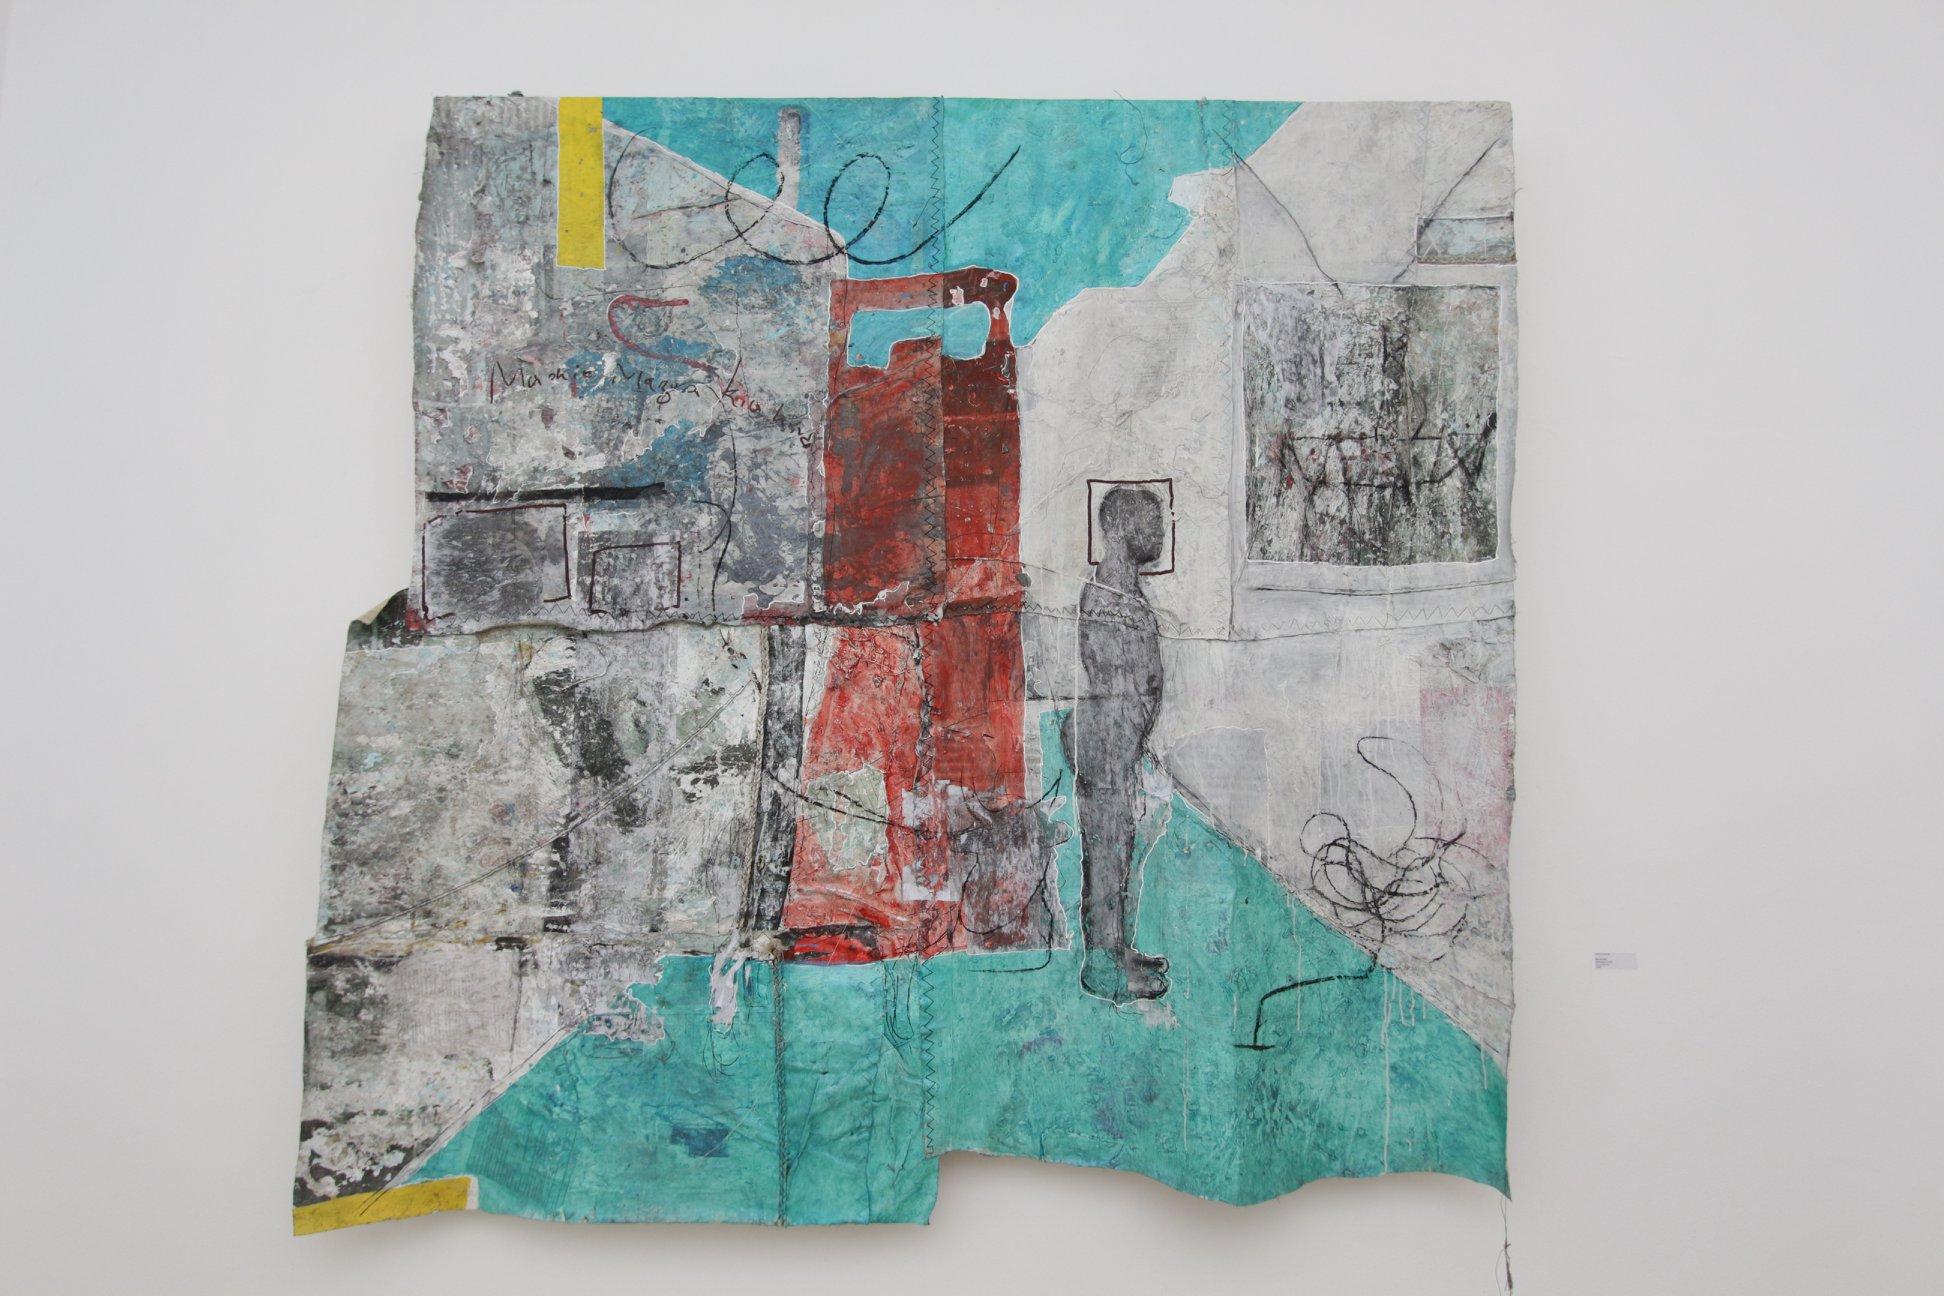 Kaloki Nyamaï, Novala Nae, Technique mixte 213 x 216 cm, 2019.